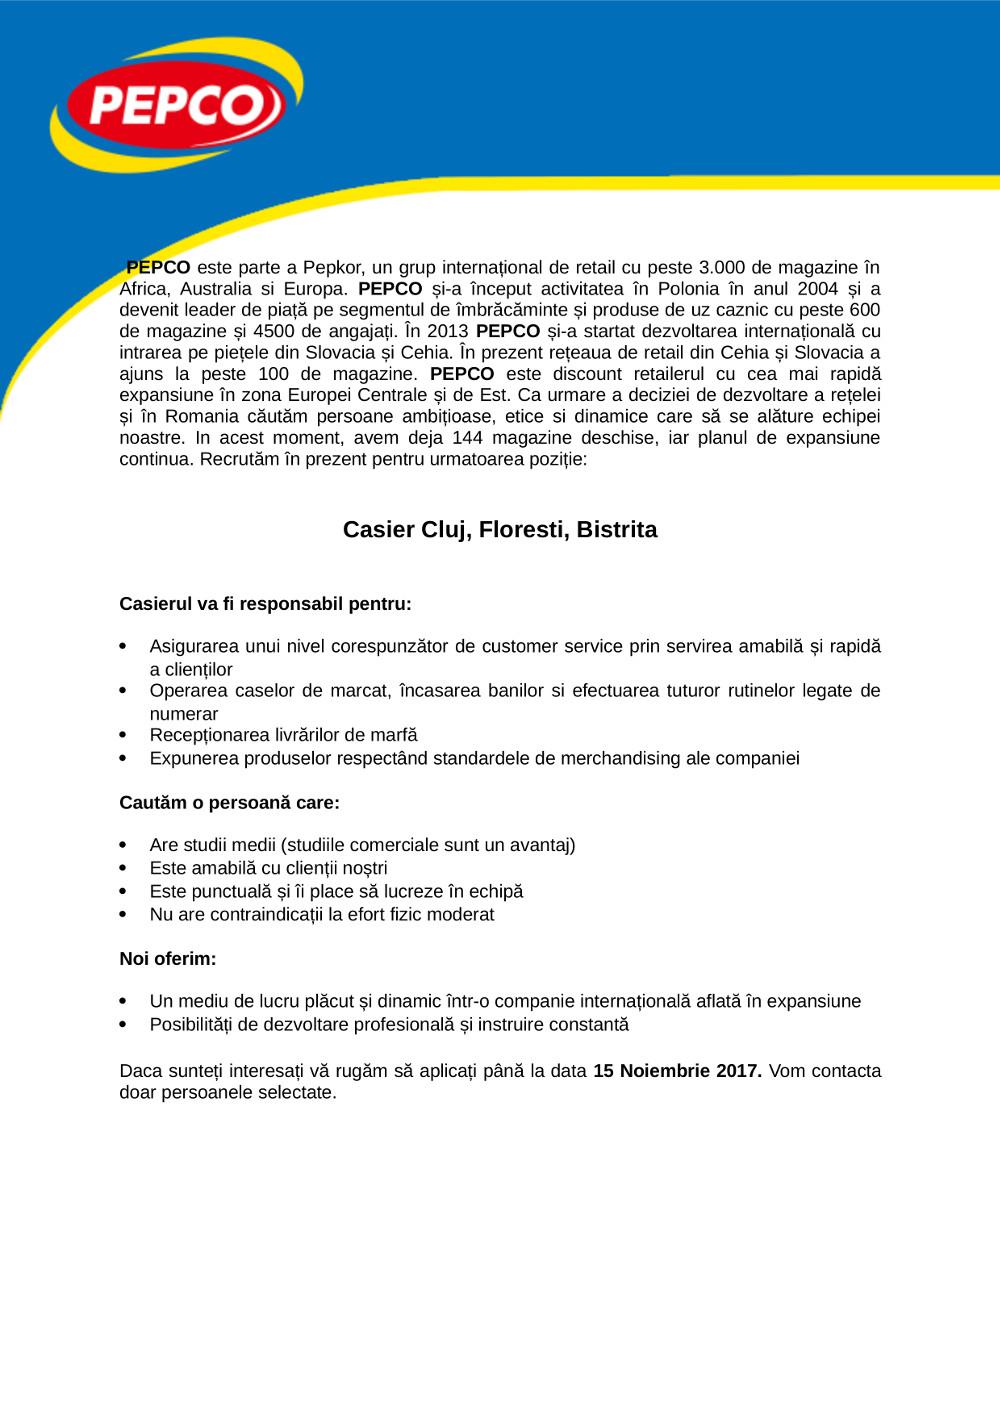 Casier Cluj, Floresti, Bistrita